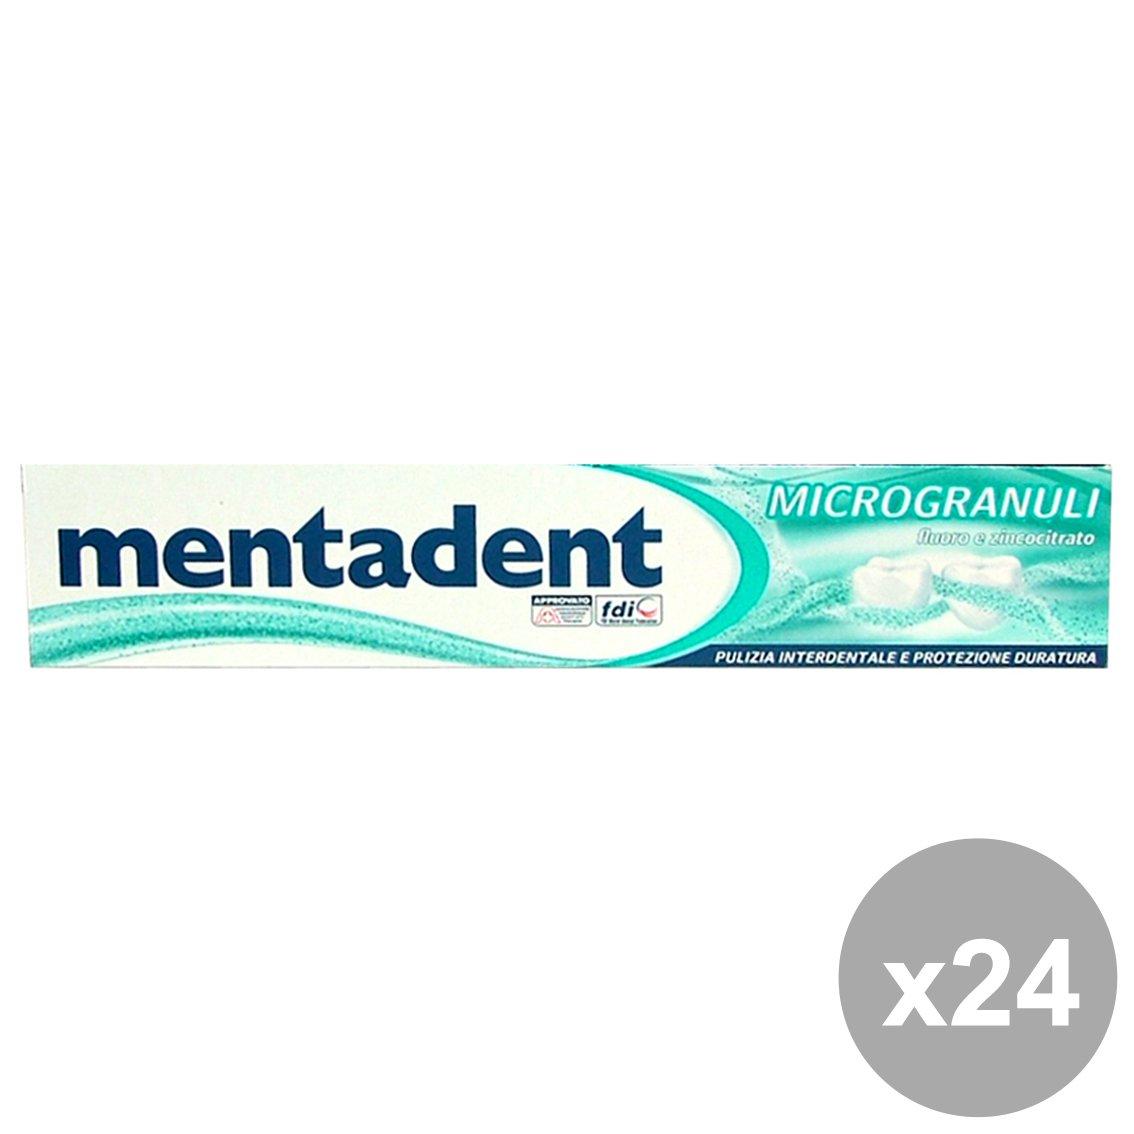 Set 24 MentaDENT Dentifricio MICROGRANULI 75 Ml. Hautpflege